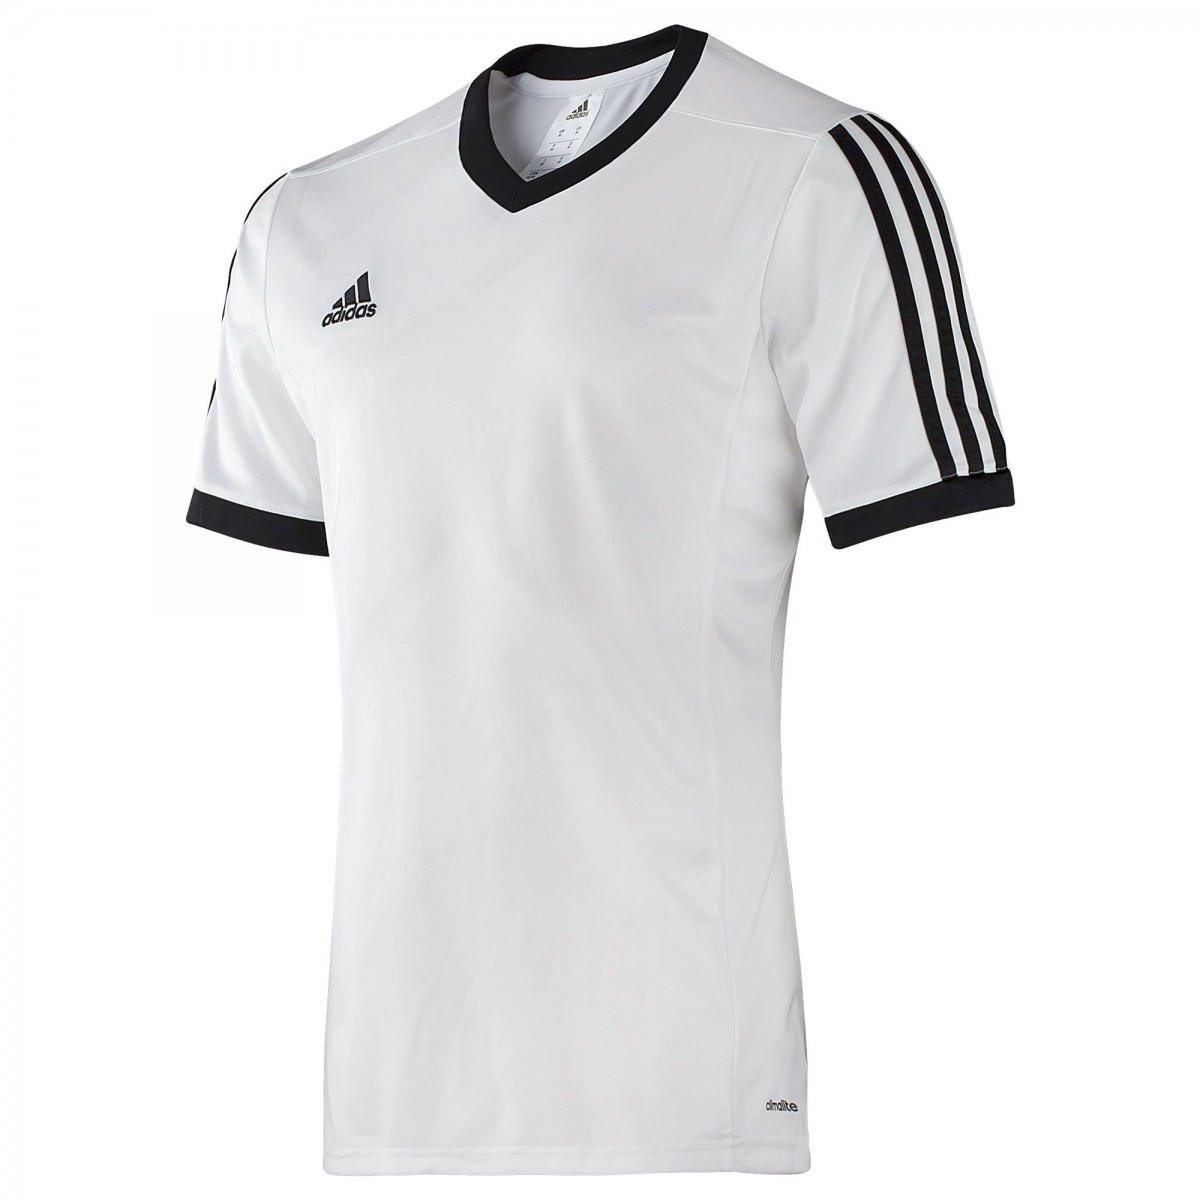 c4098272a86 Bizz Store - Camisa Masculina Adidas Tabela 14 Futebol Branca